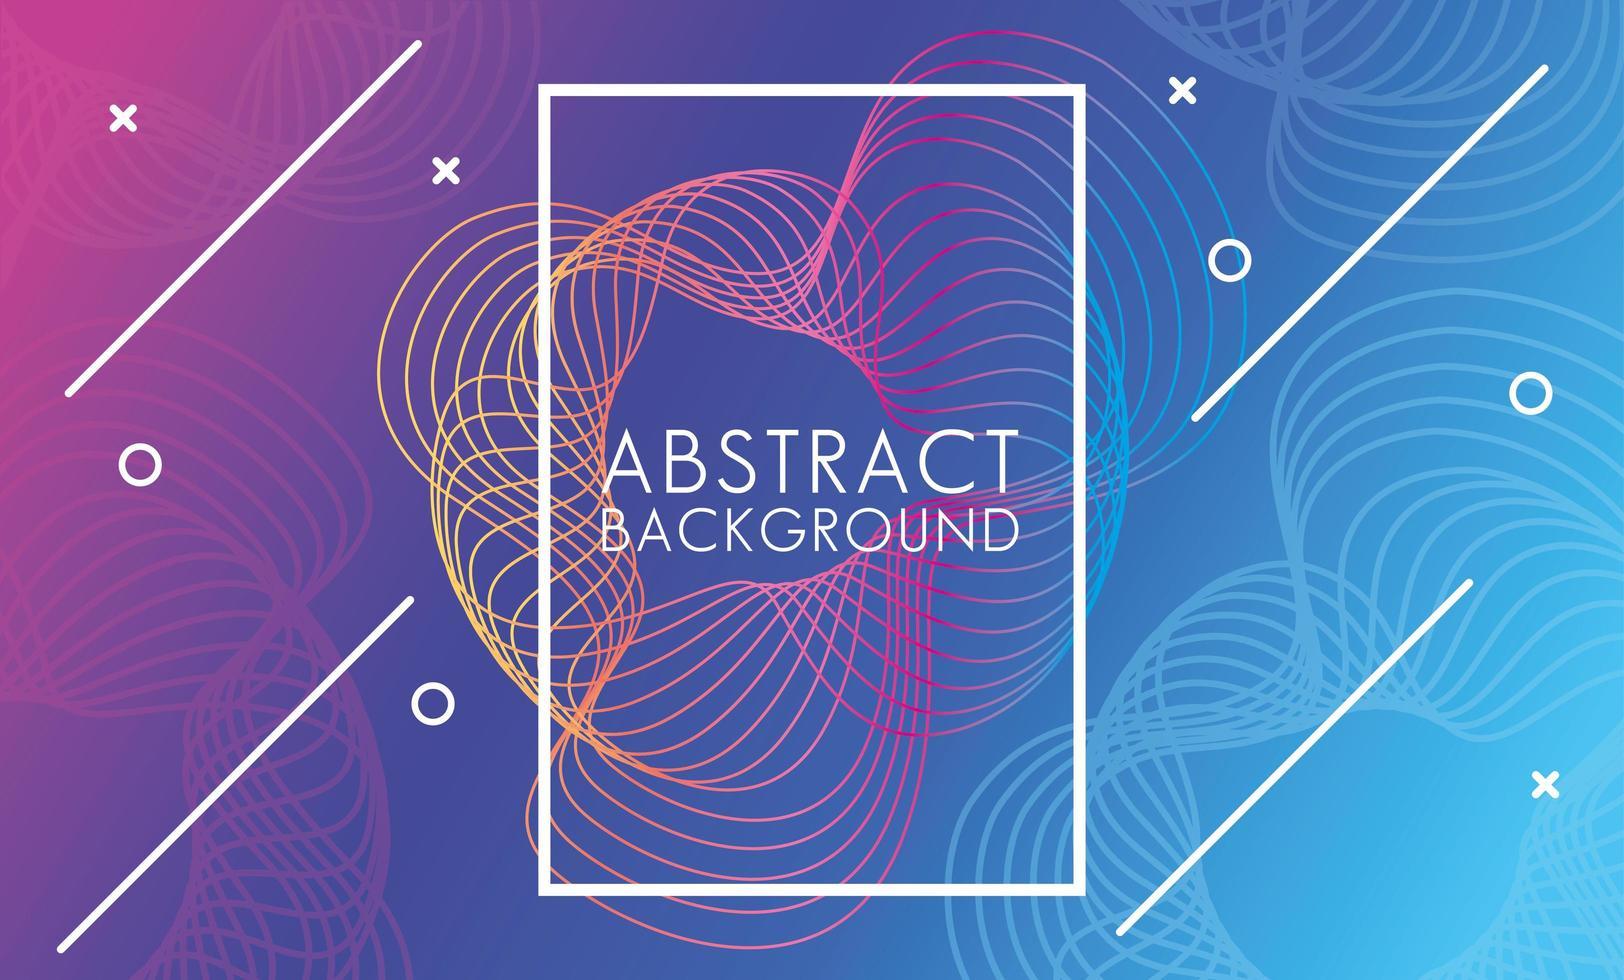 levendige moderne kleuren met vierkante frame abstracte krullende achtergrond vector